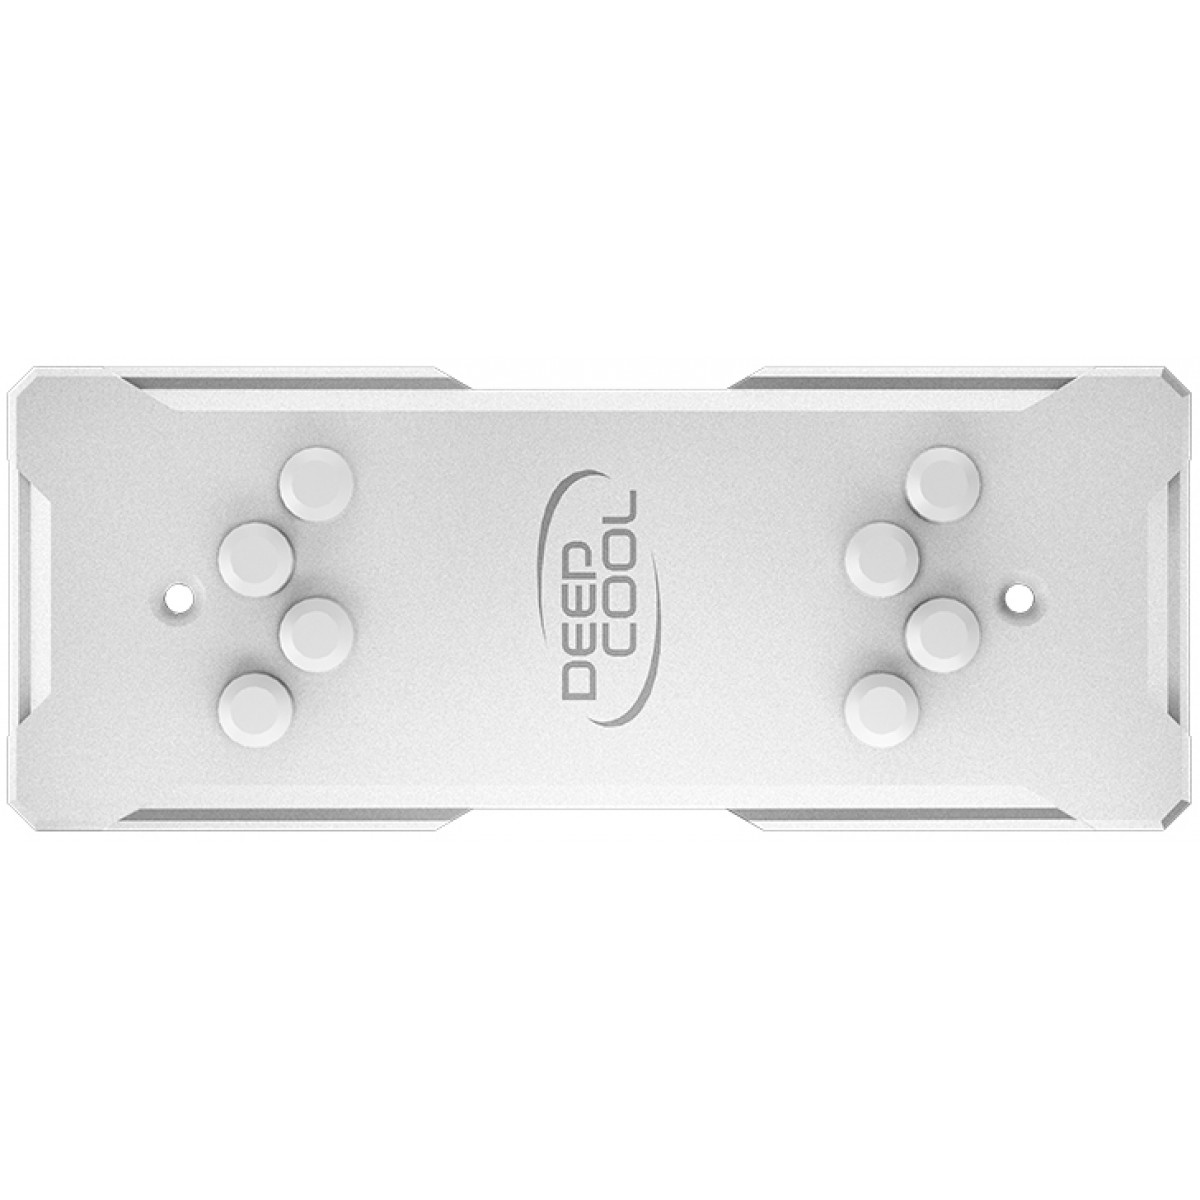 Cooler para Processador DeepCool Gammaxx GTE V2, 120mm, Intel-AMD, White, DP-MCH4-GMX-GTE-V2WH